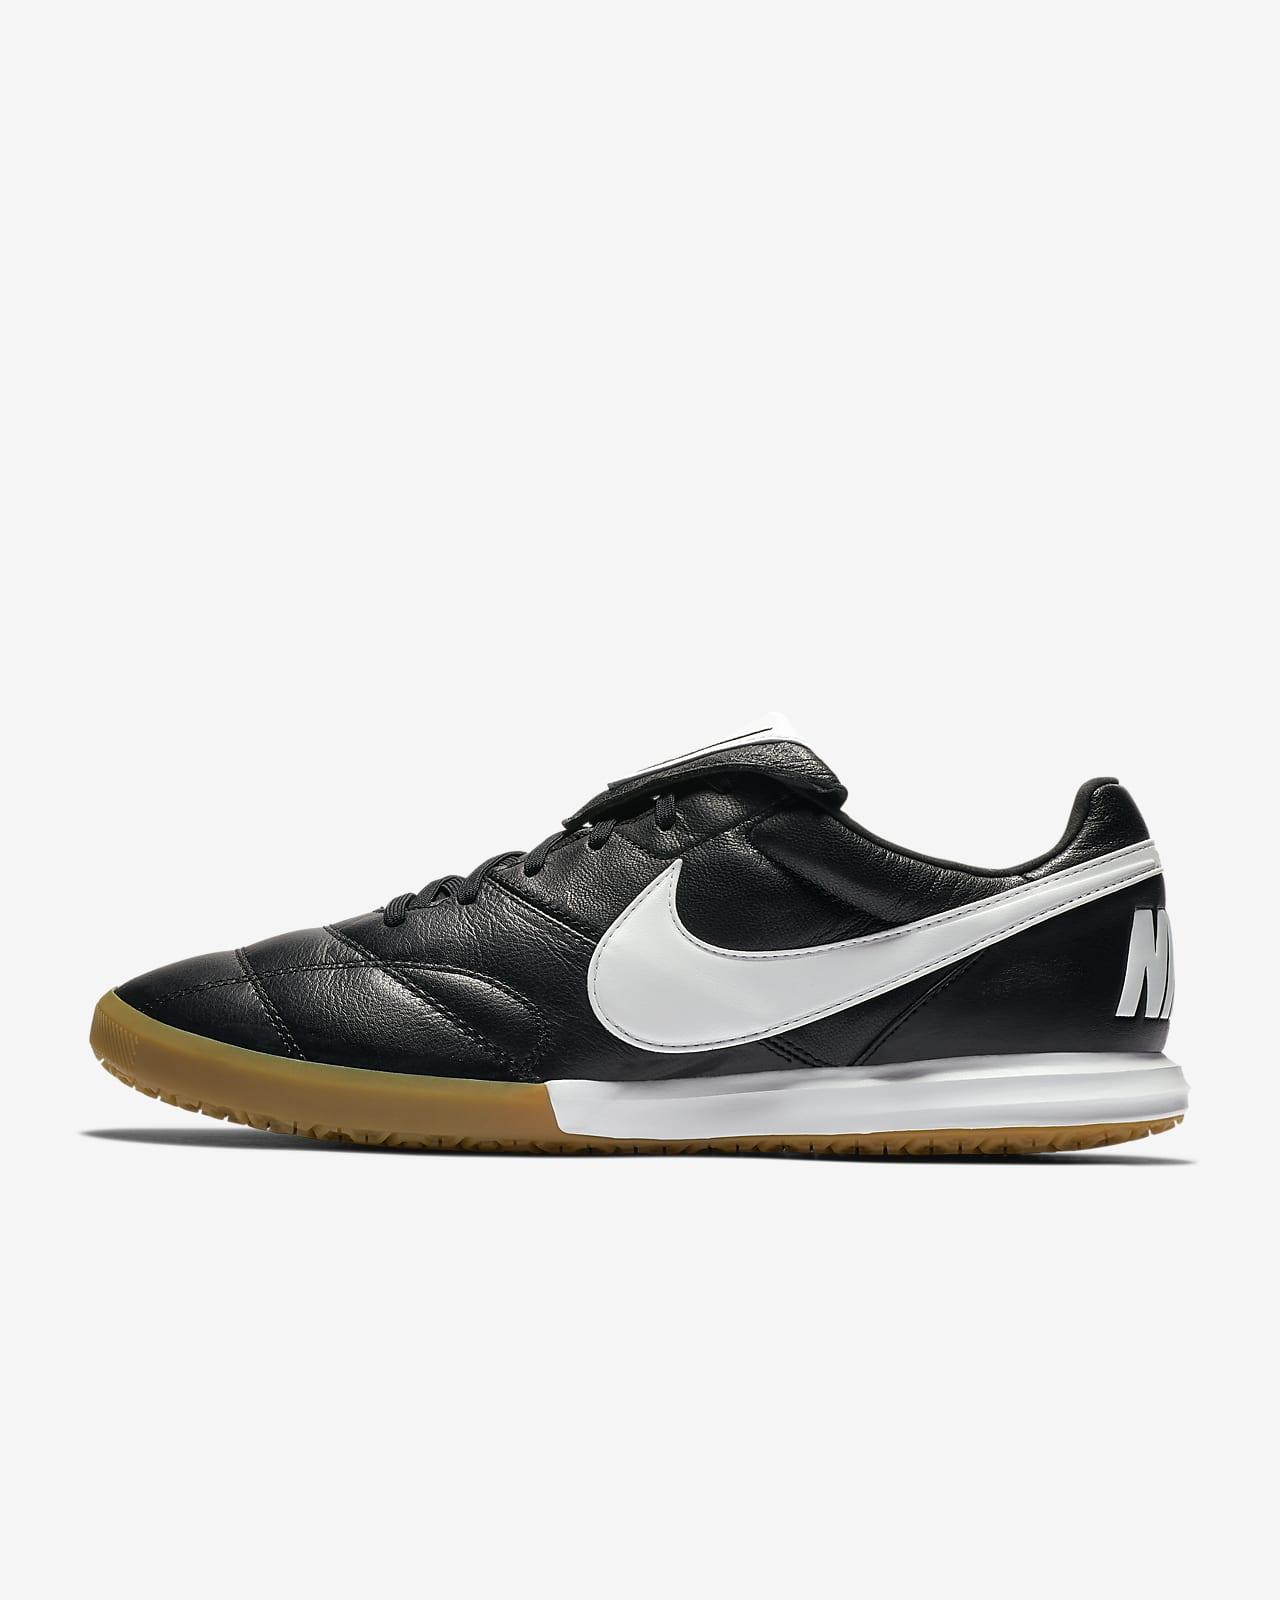 nike premier turf shoes